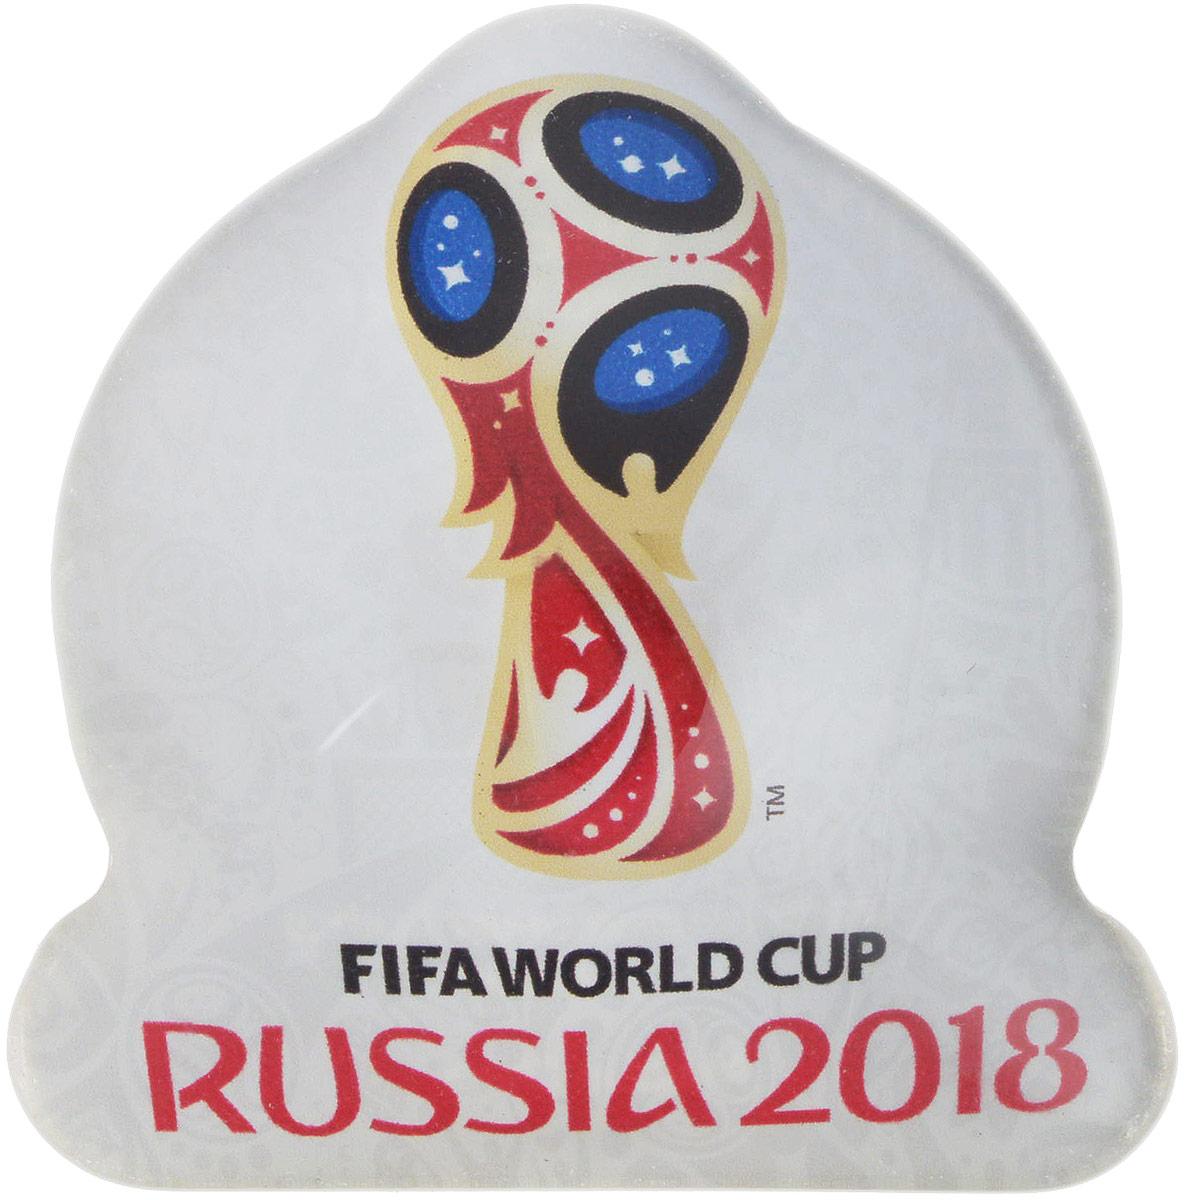 Магнит сувенирный FIFA 2018 Кубок, 5 х 5 см. СН029 магнит fifa 2018 россия пвх